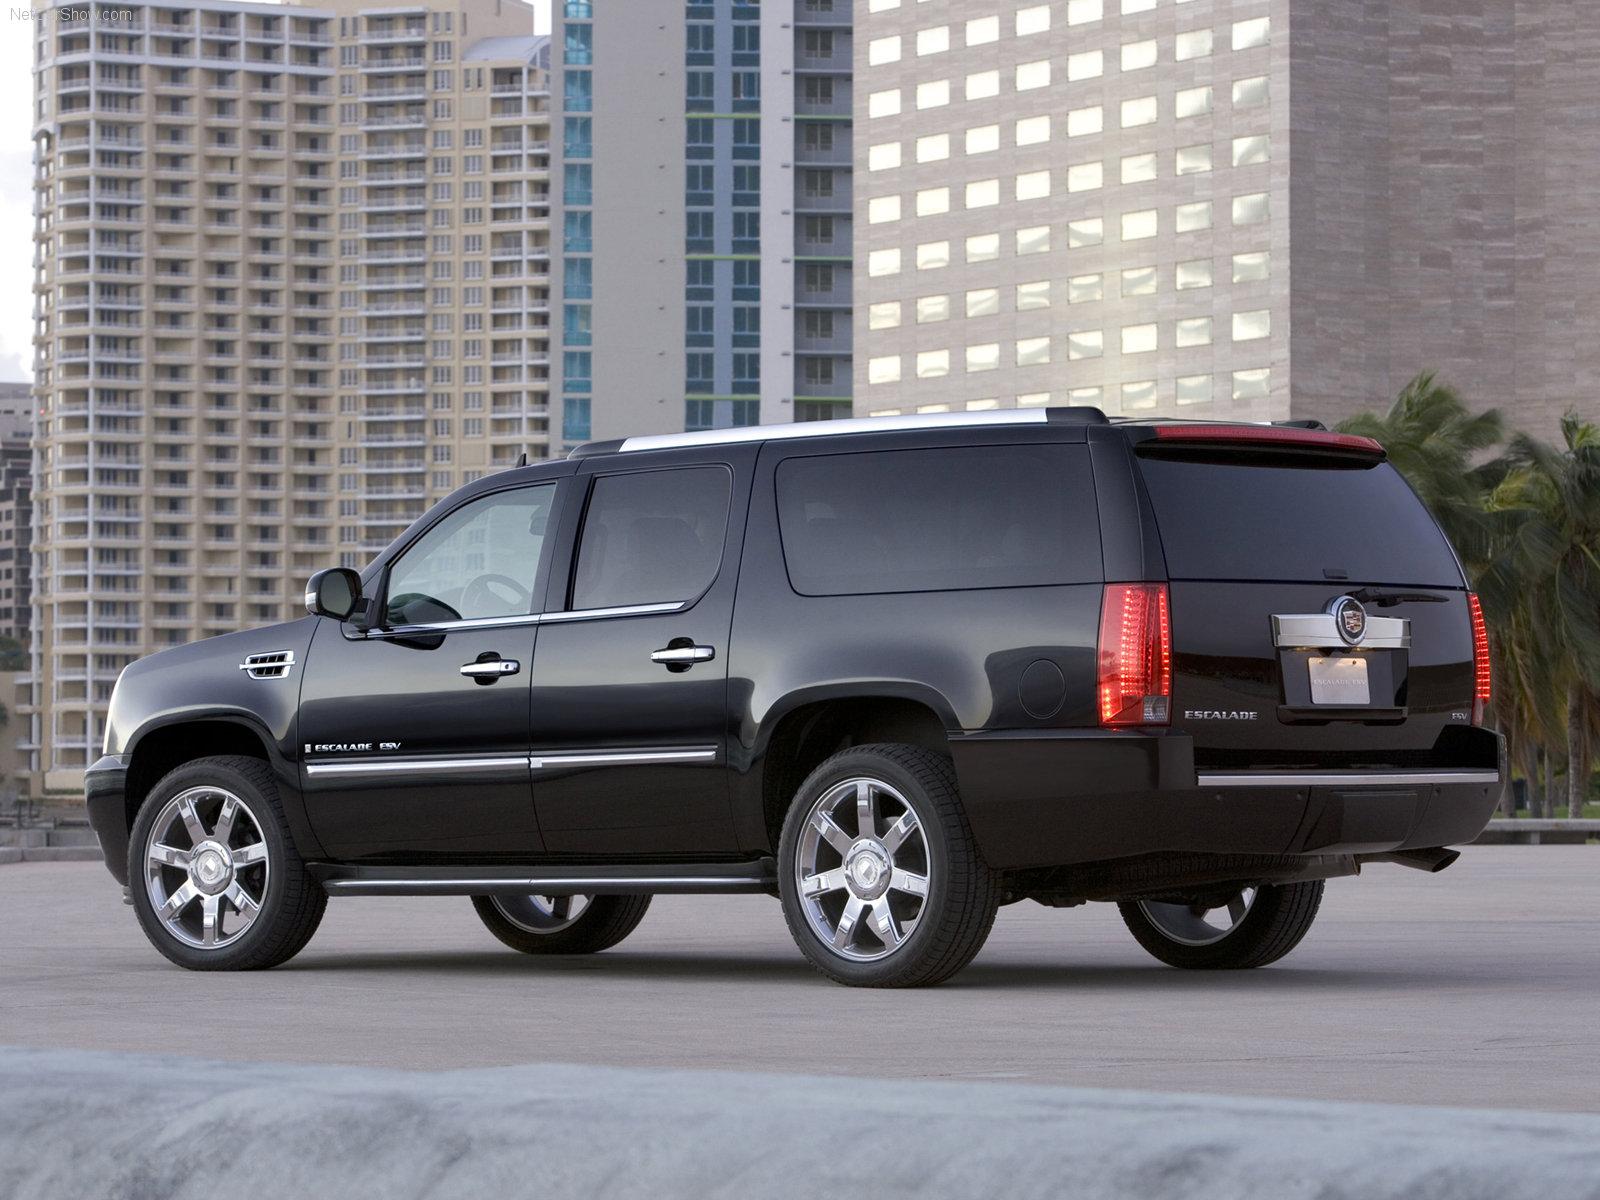 Cadillac-Escalade_ESV_2007_1600x1200_wallpaper_06.jpg